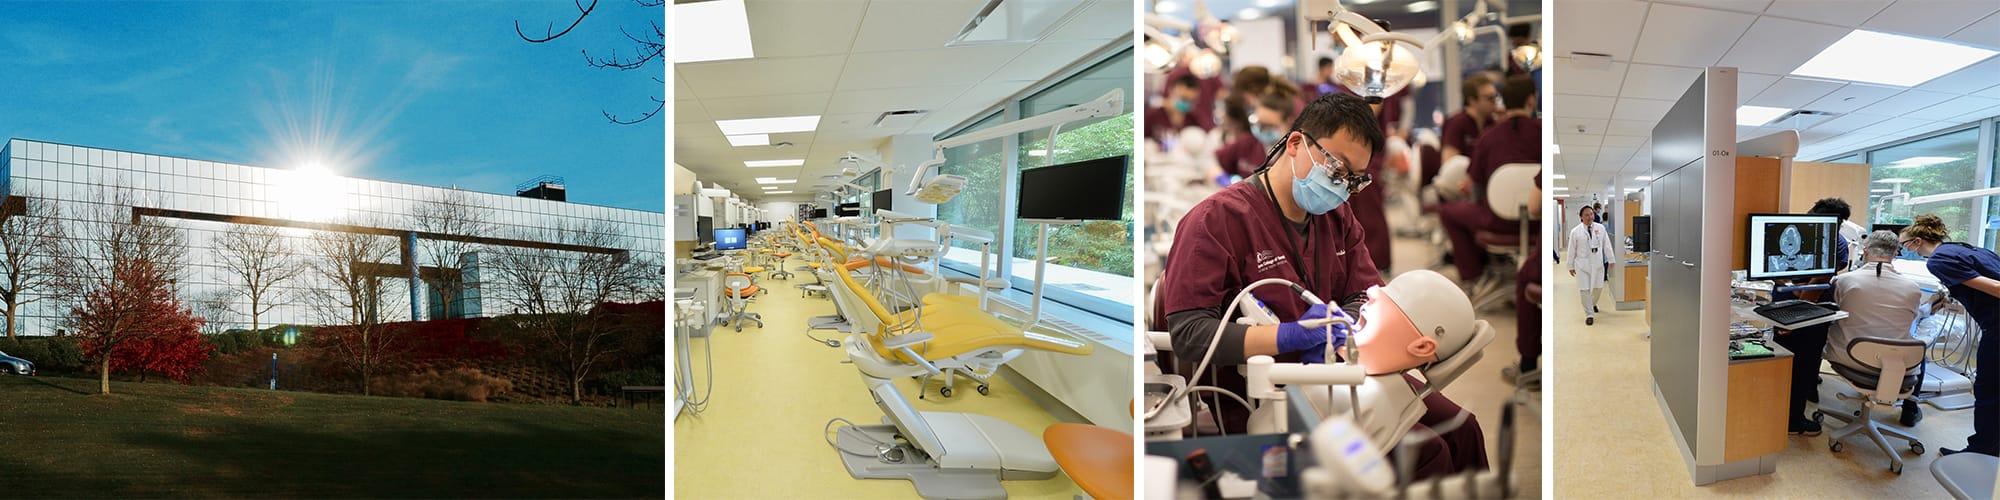 Touro College of Dental Medicine | Touro College